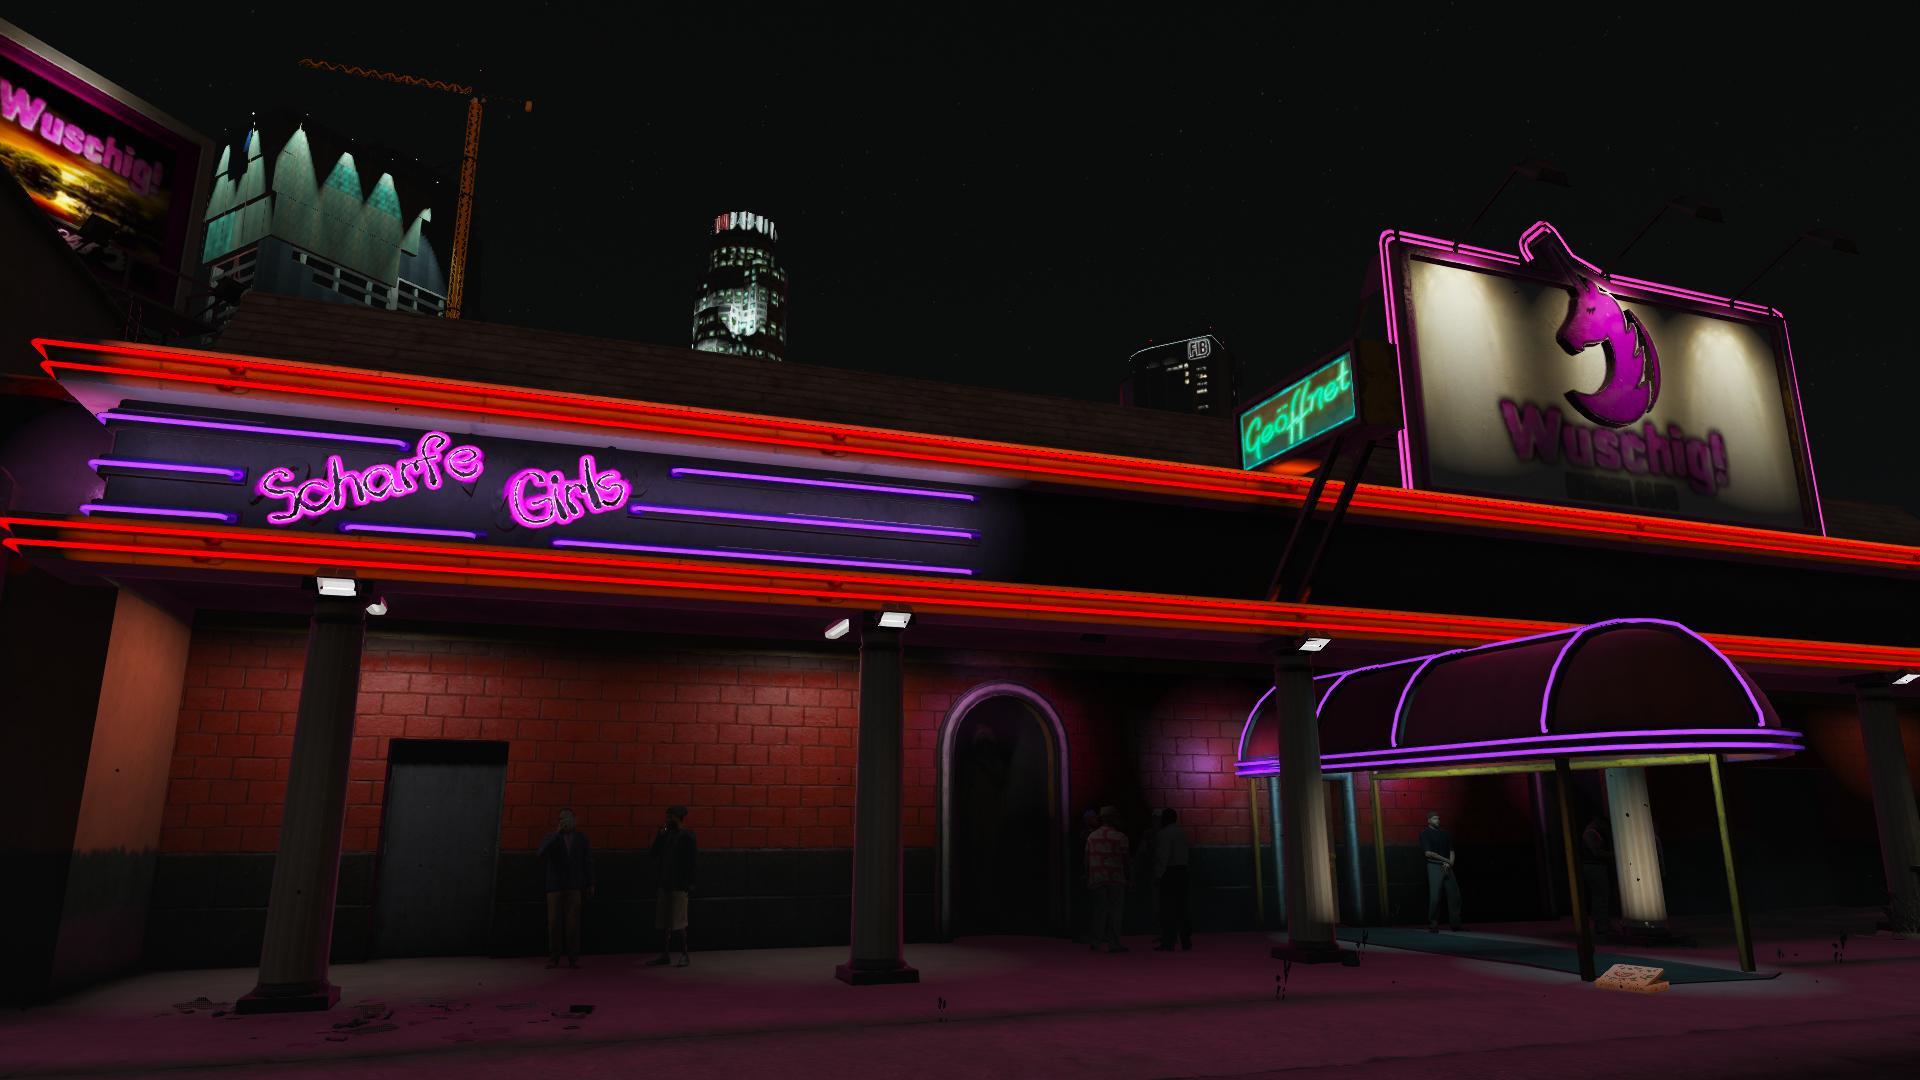 Gta V Strip Club | www.imgkid.com - The Image Kid Has It!